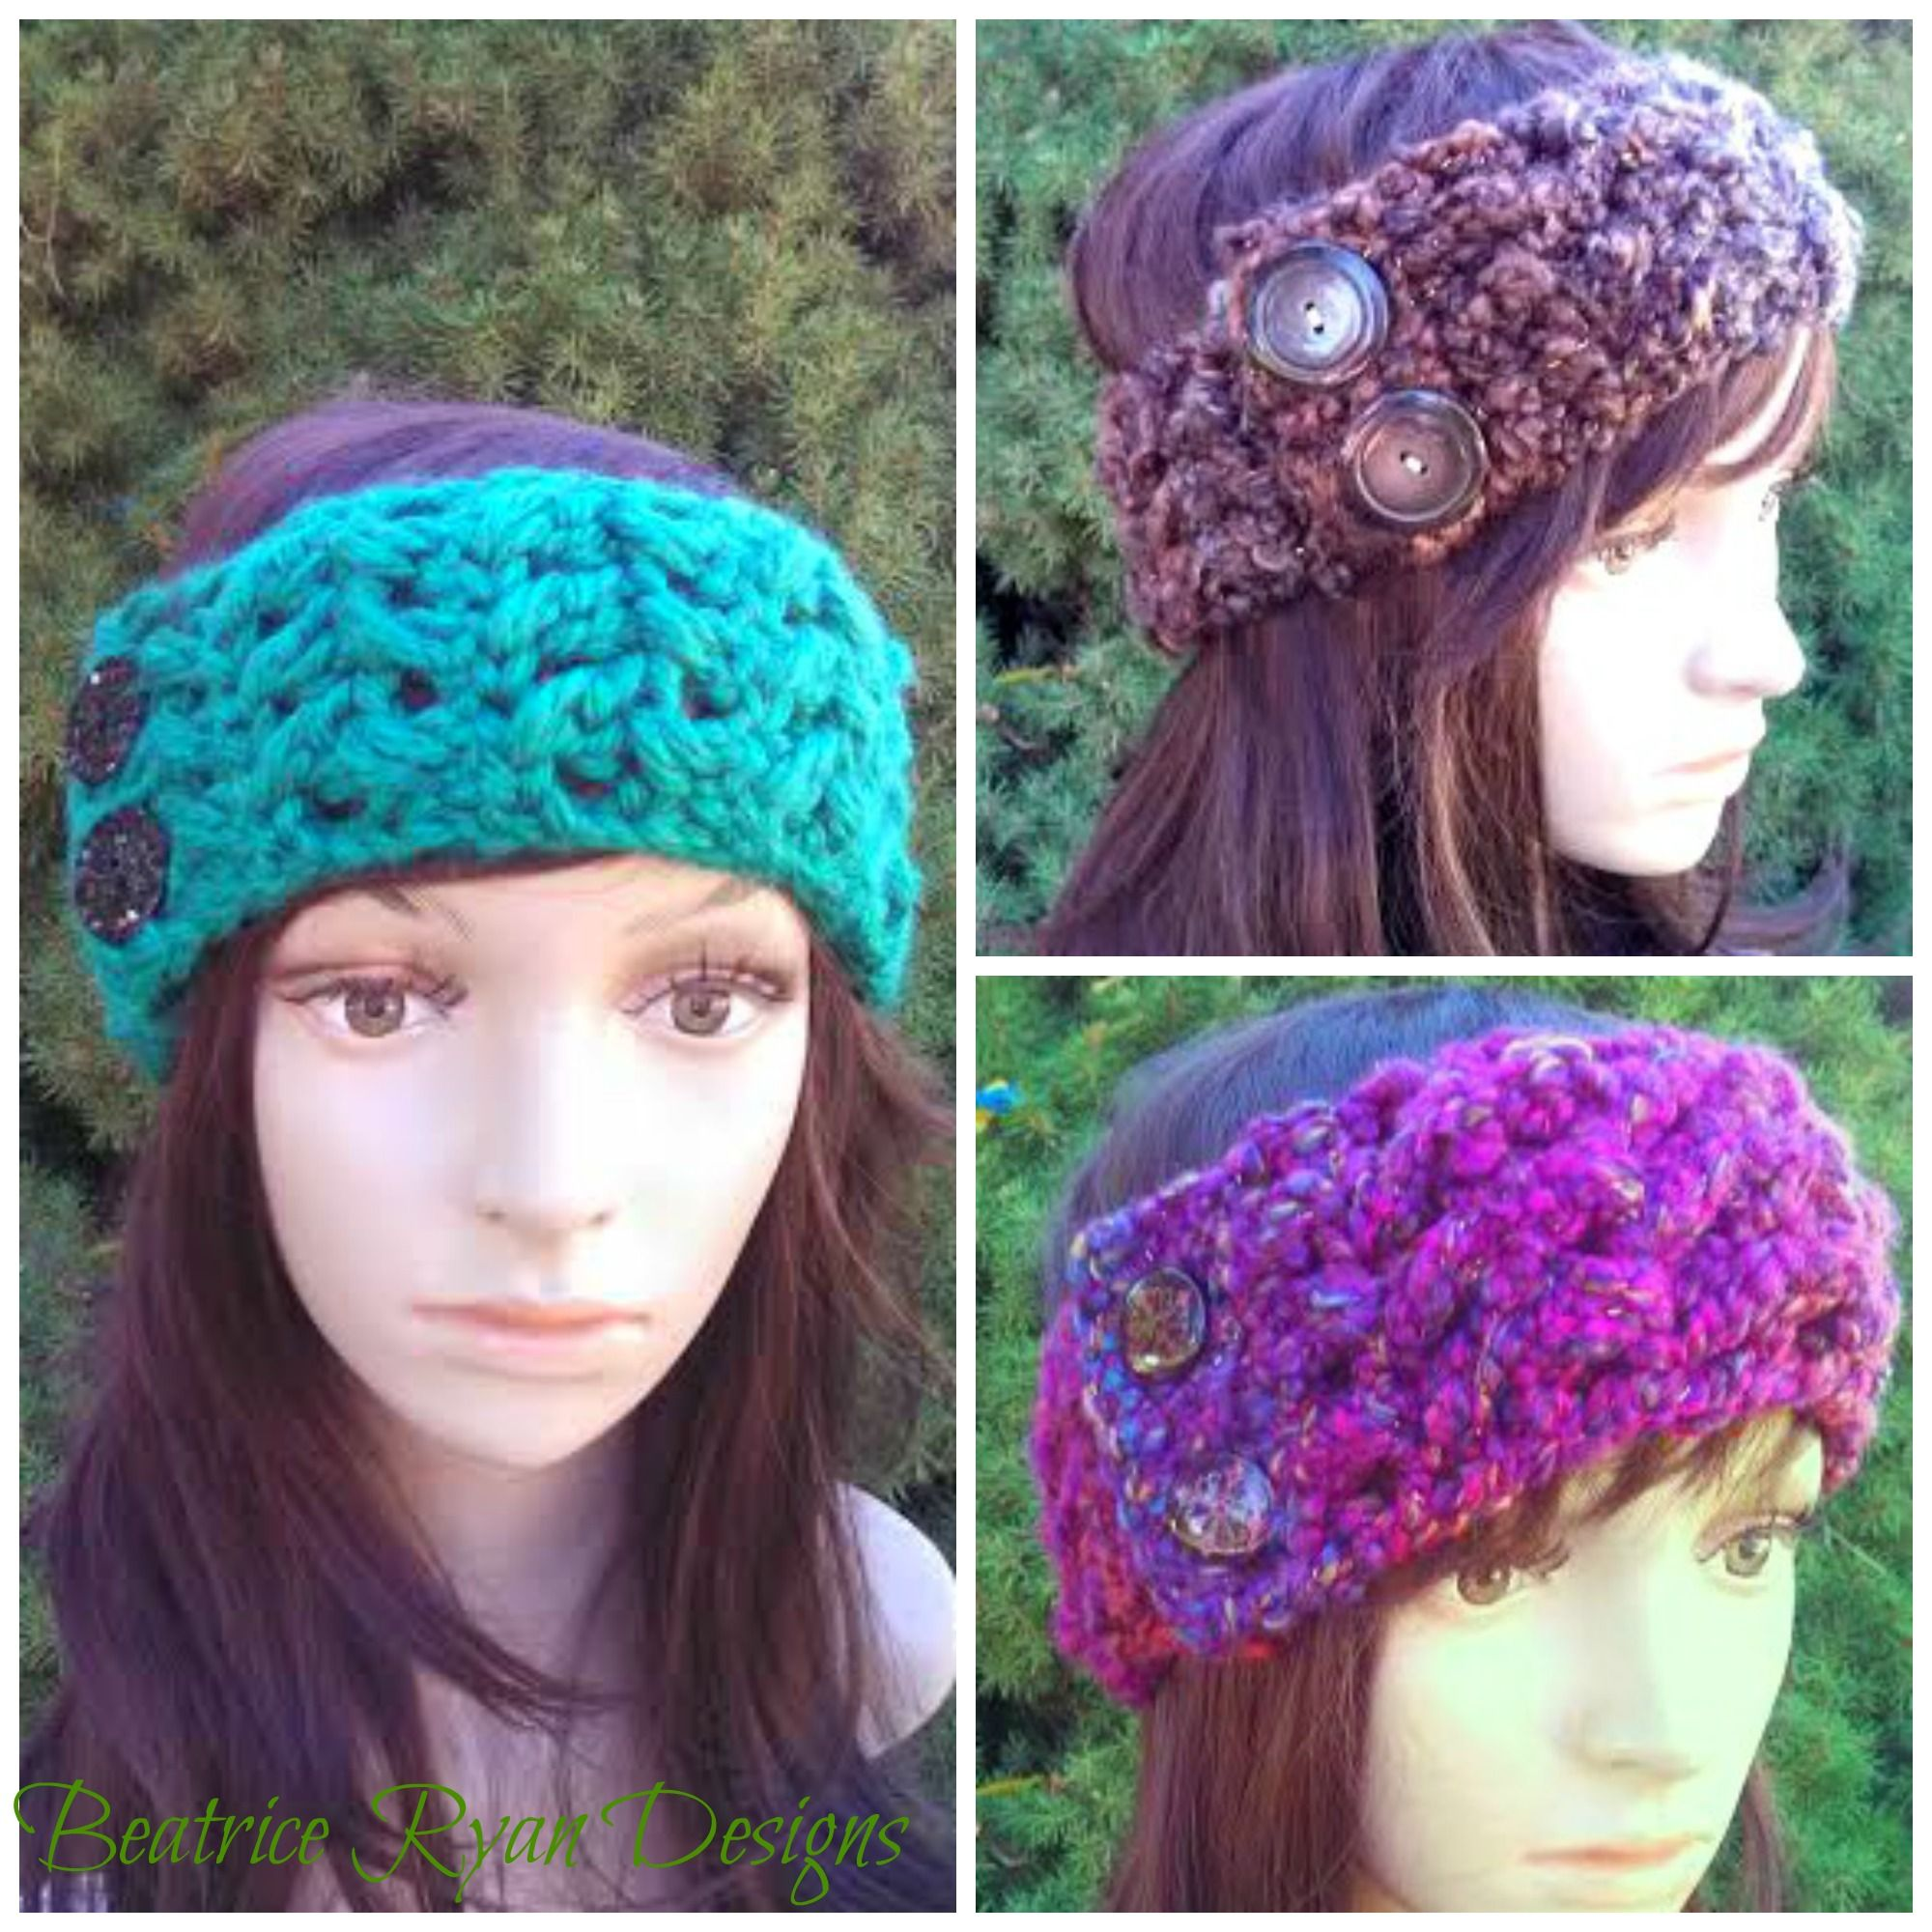 Effortless Chic Headband Free Pattern | Headbands | Pinterest ...